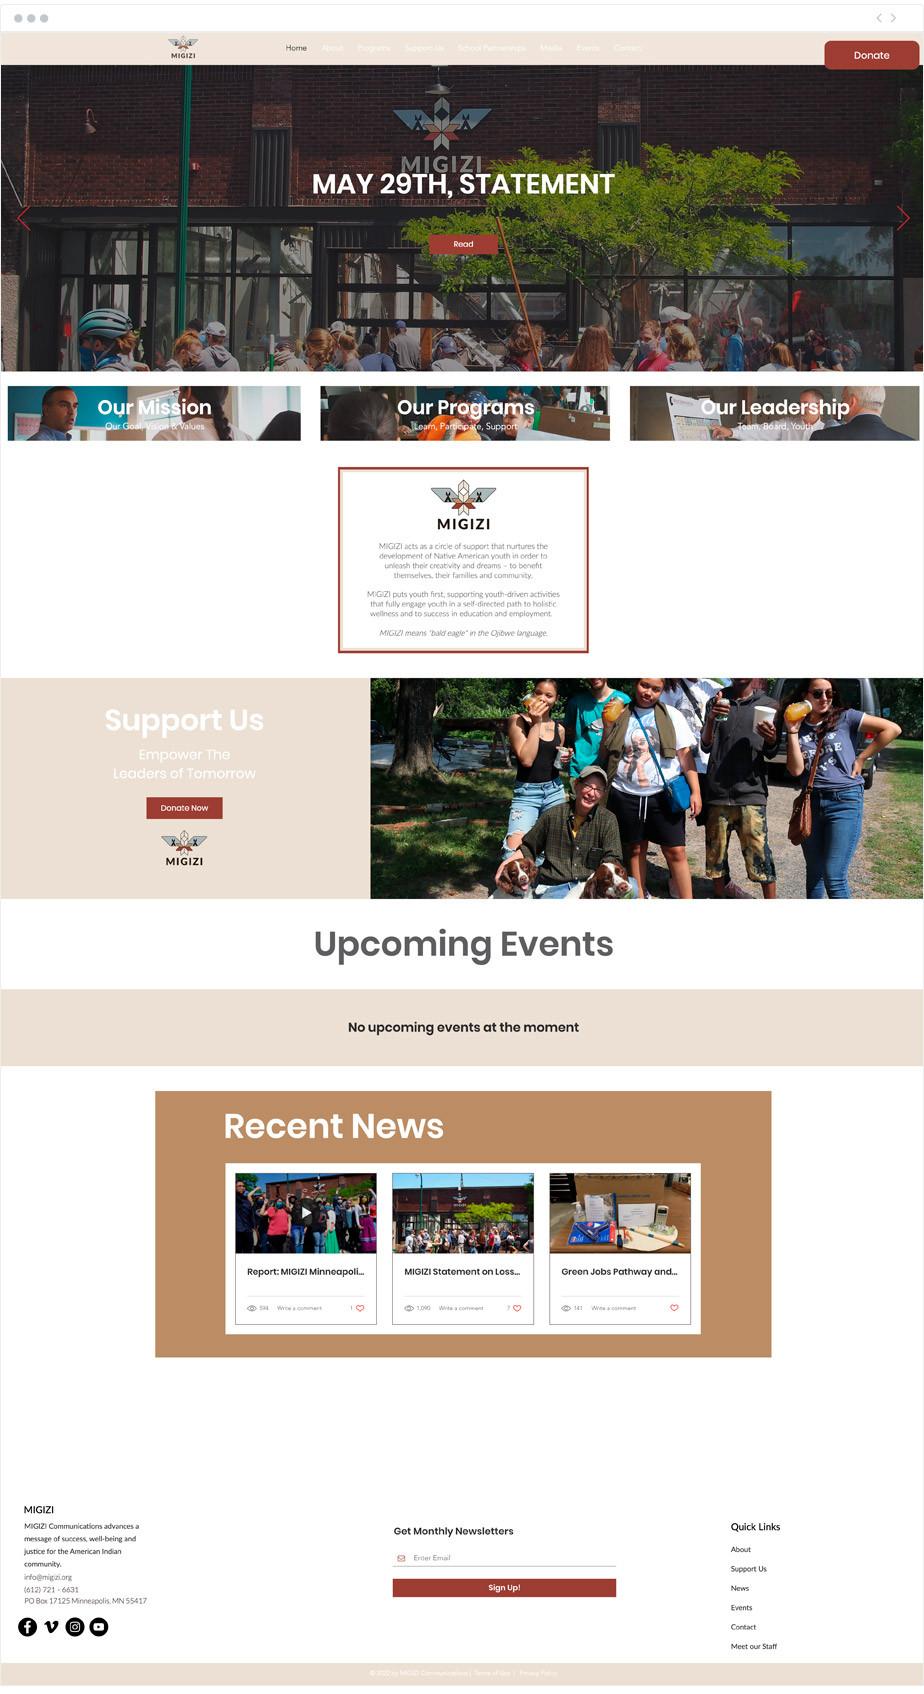 MIGIZI nonprofit website